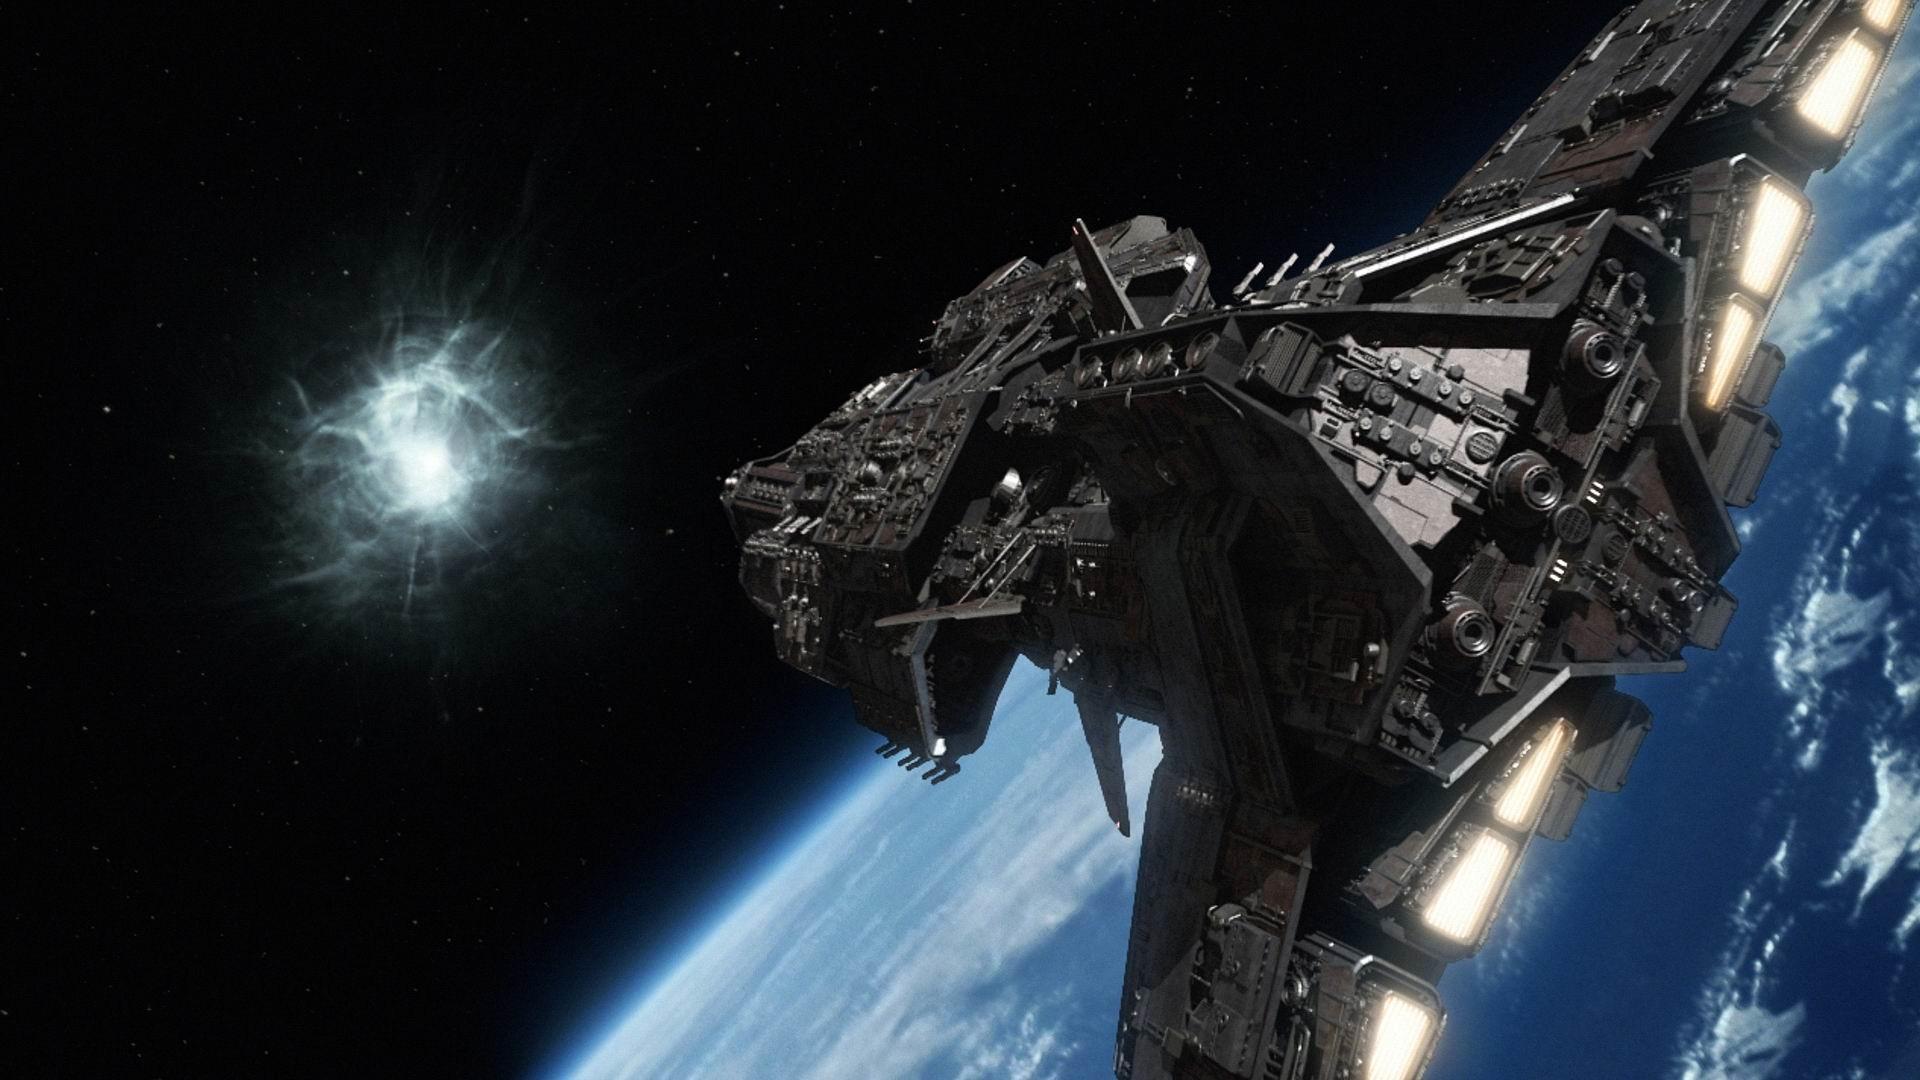 Spaceships Aurora Class Battleship Stargate Wiki Wallpapers Resolution :  Filesize : kB, Added on August Tagged : spaceships